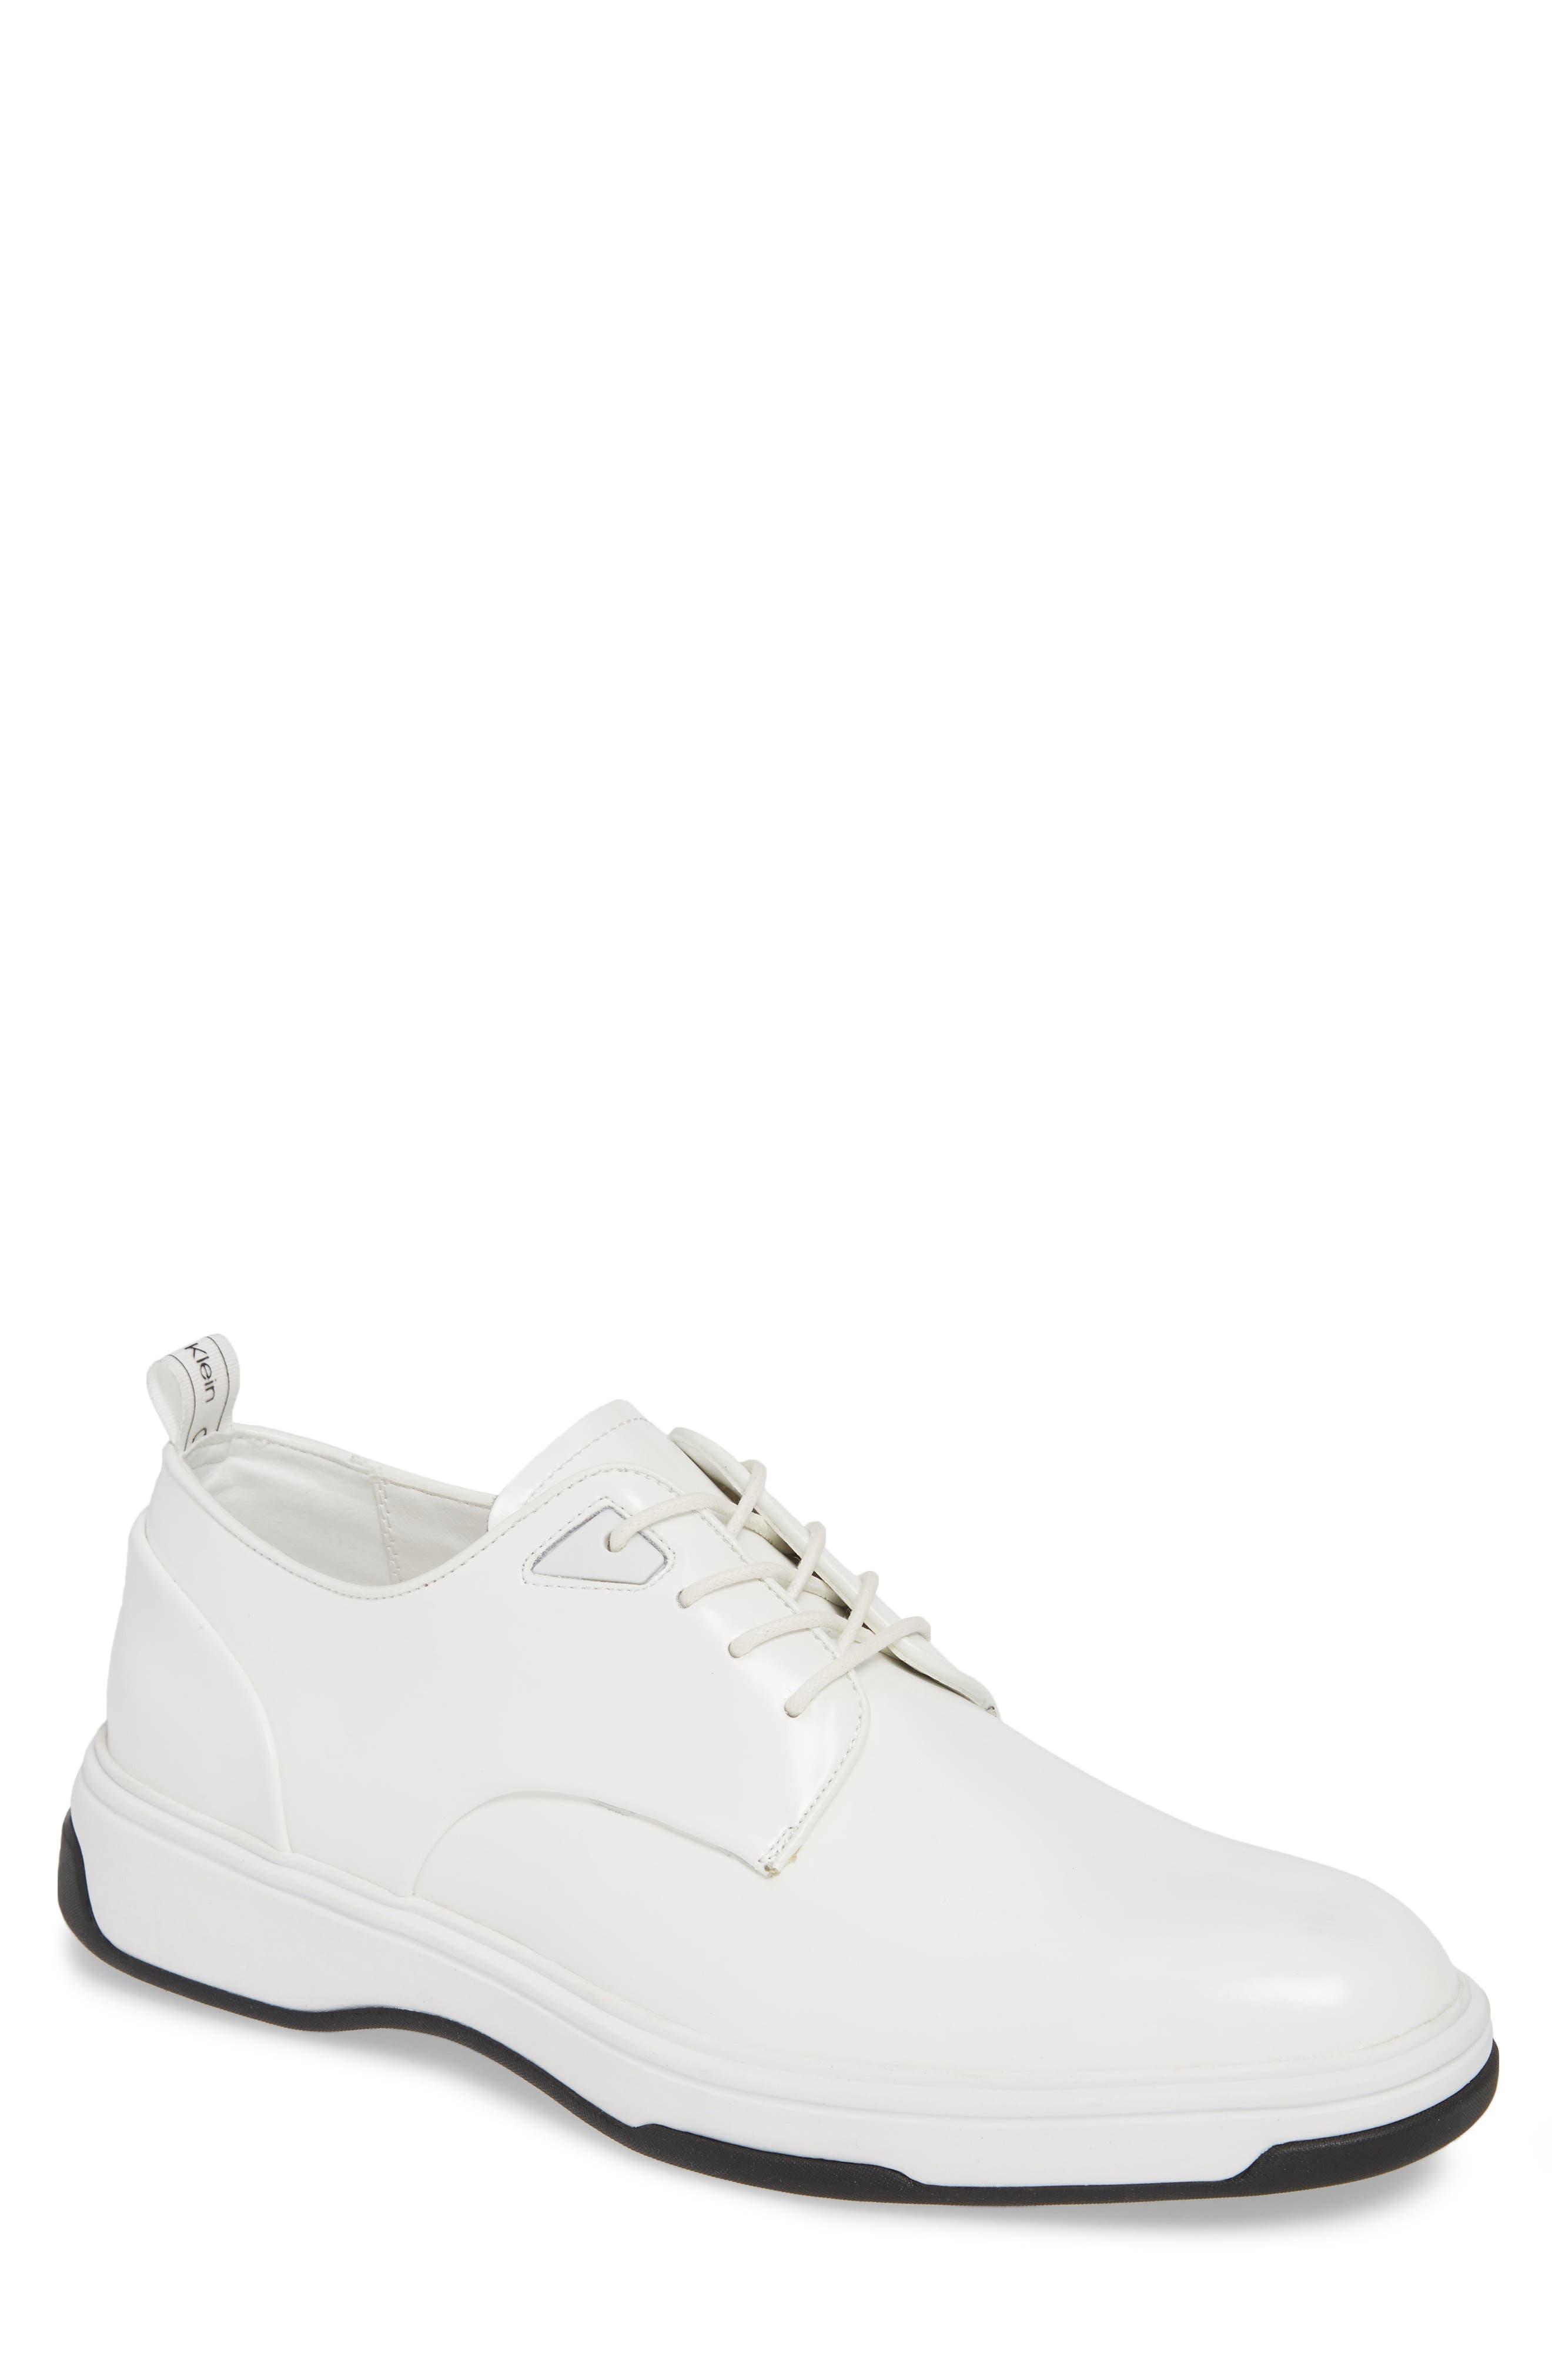 Calvin Klein Patsy Sneaker, White